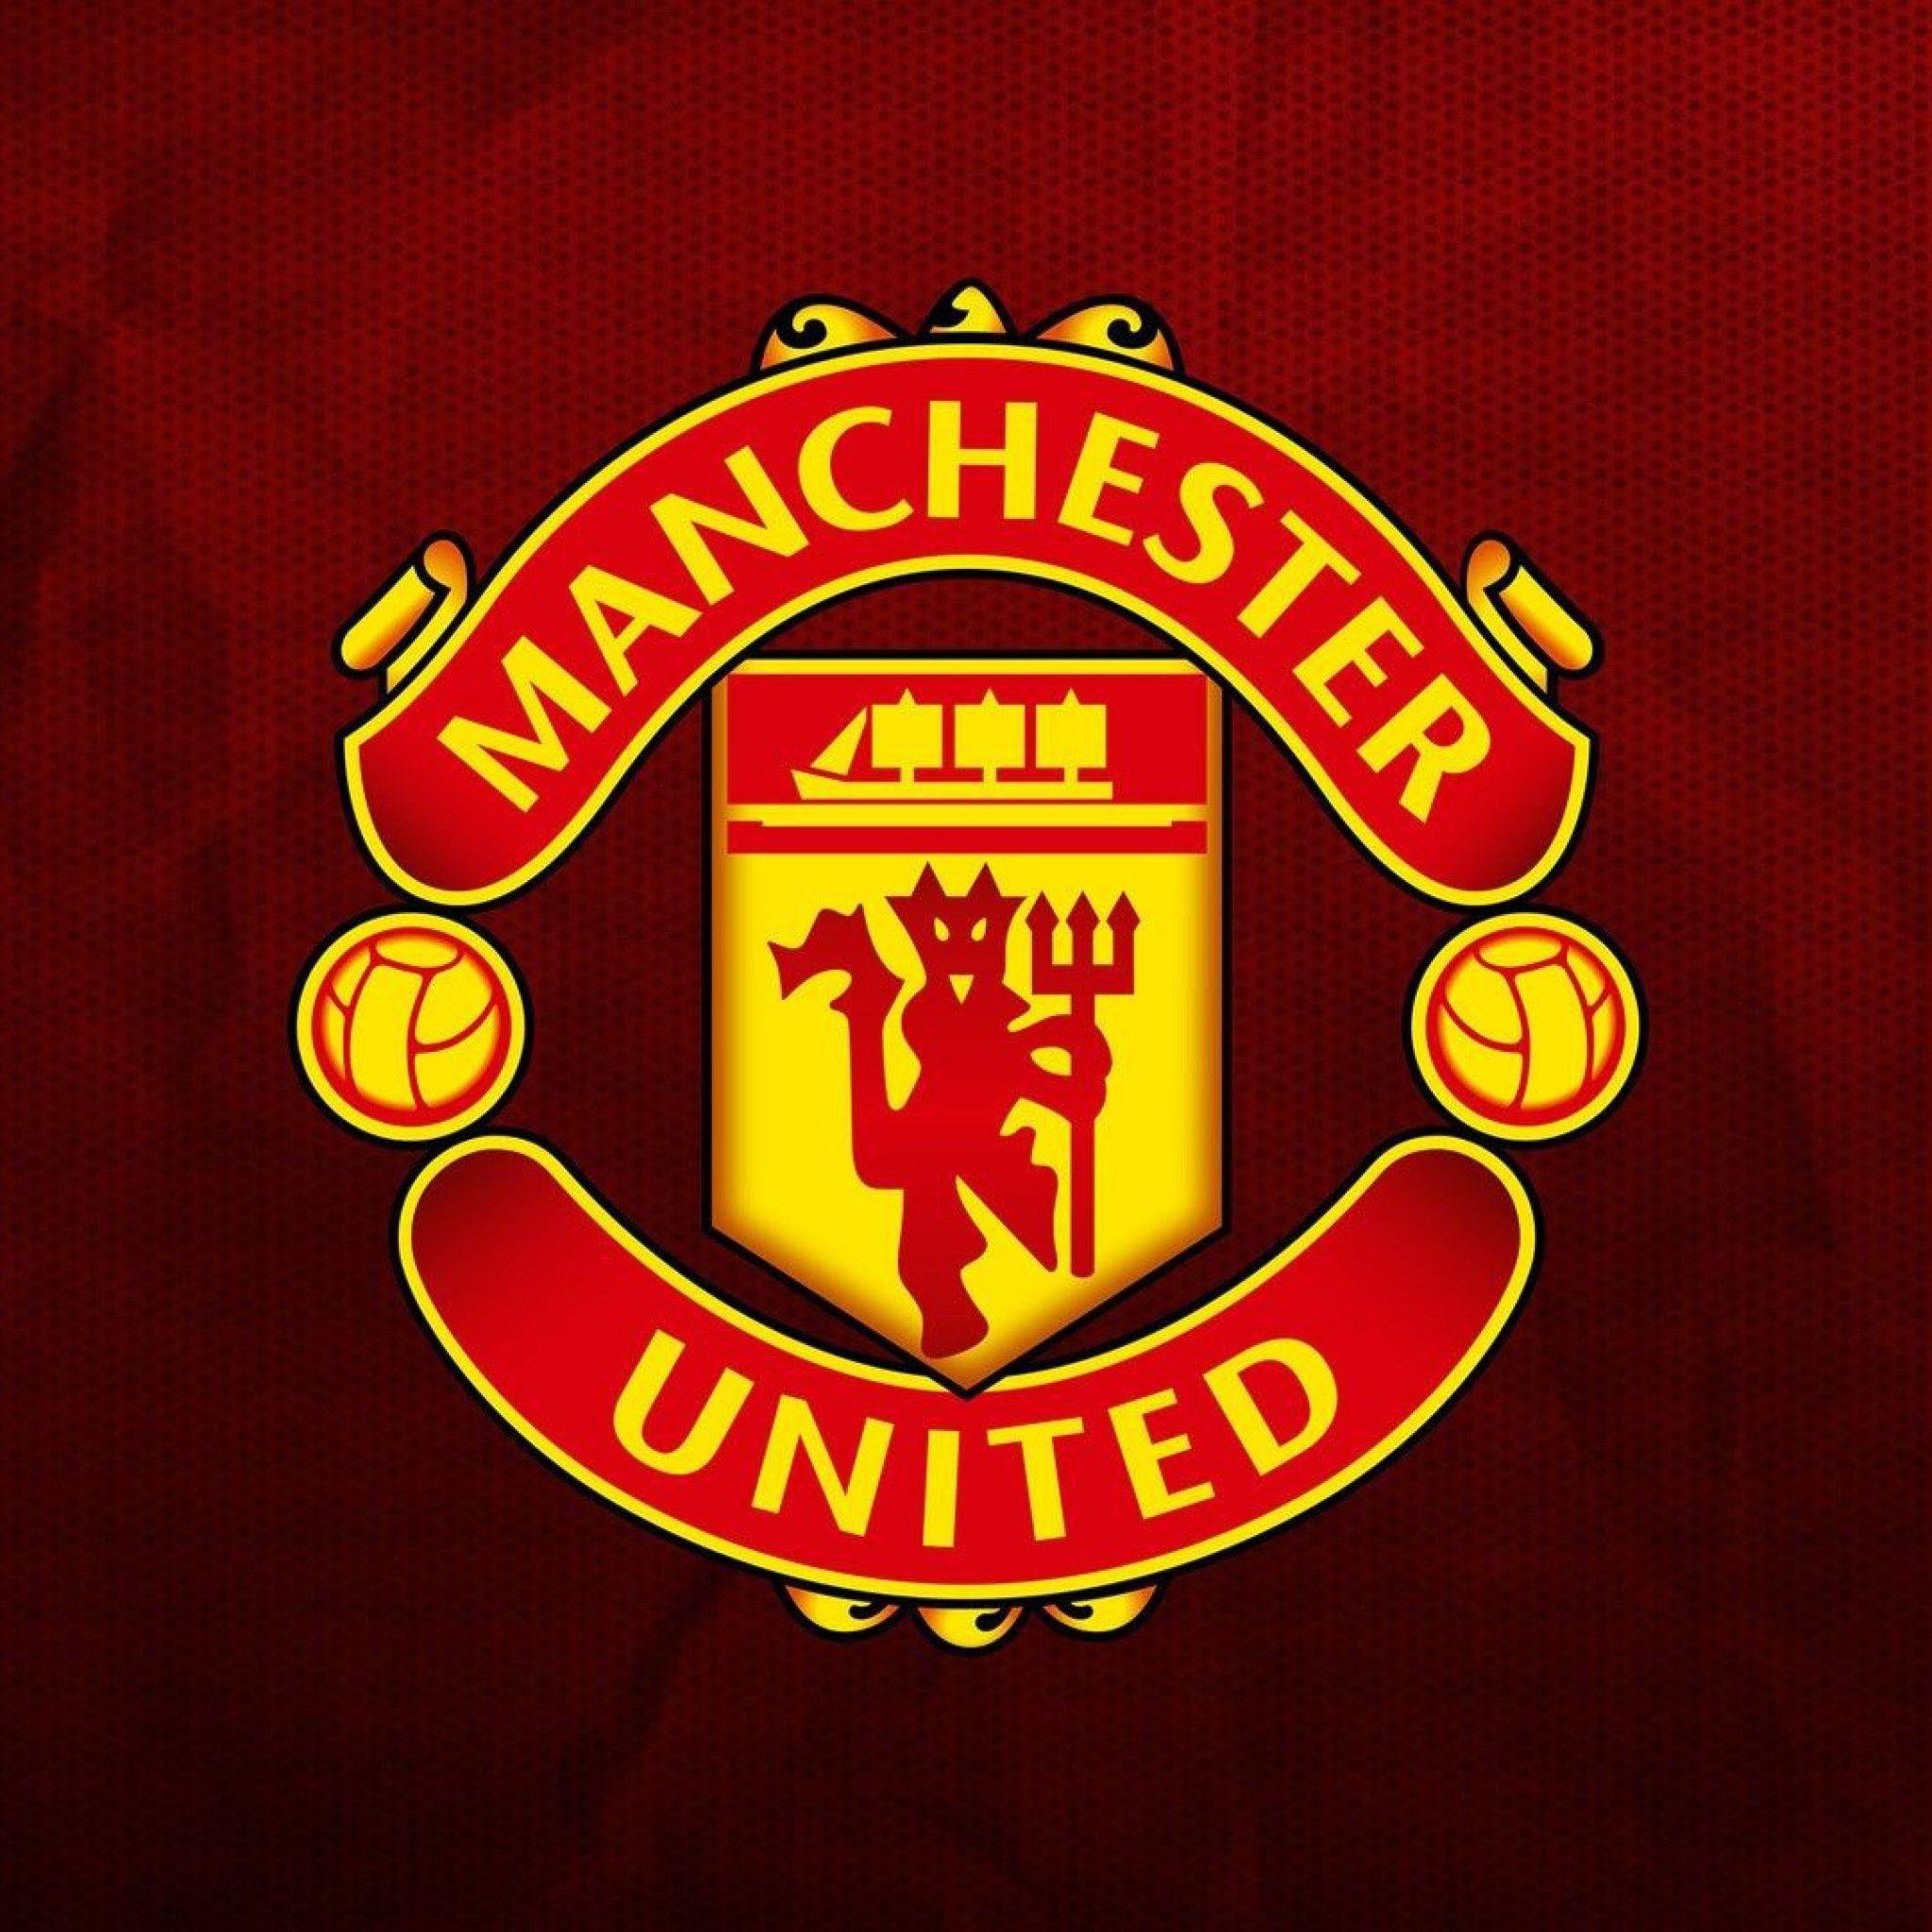 Image result for manchester united logo